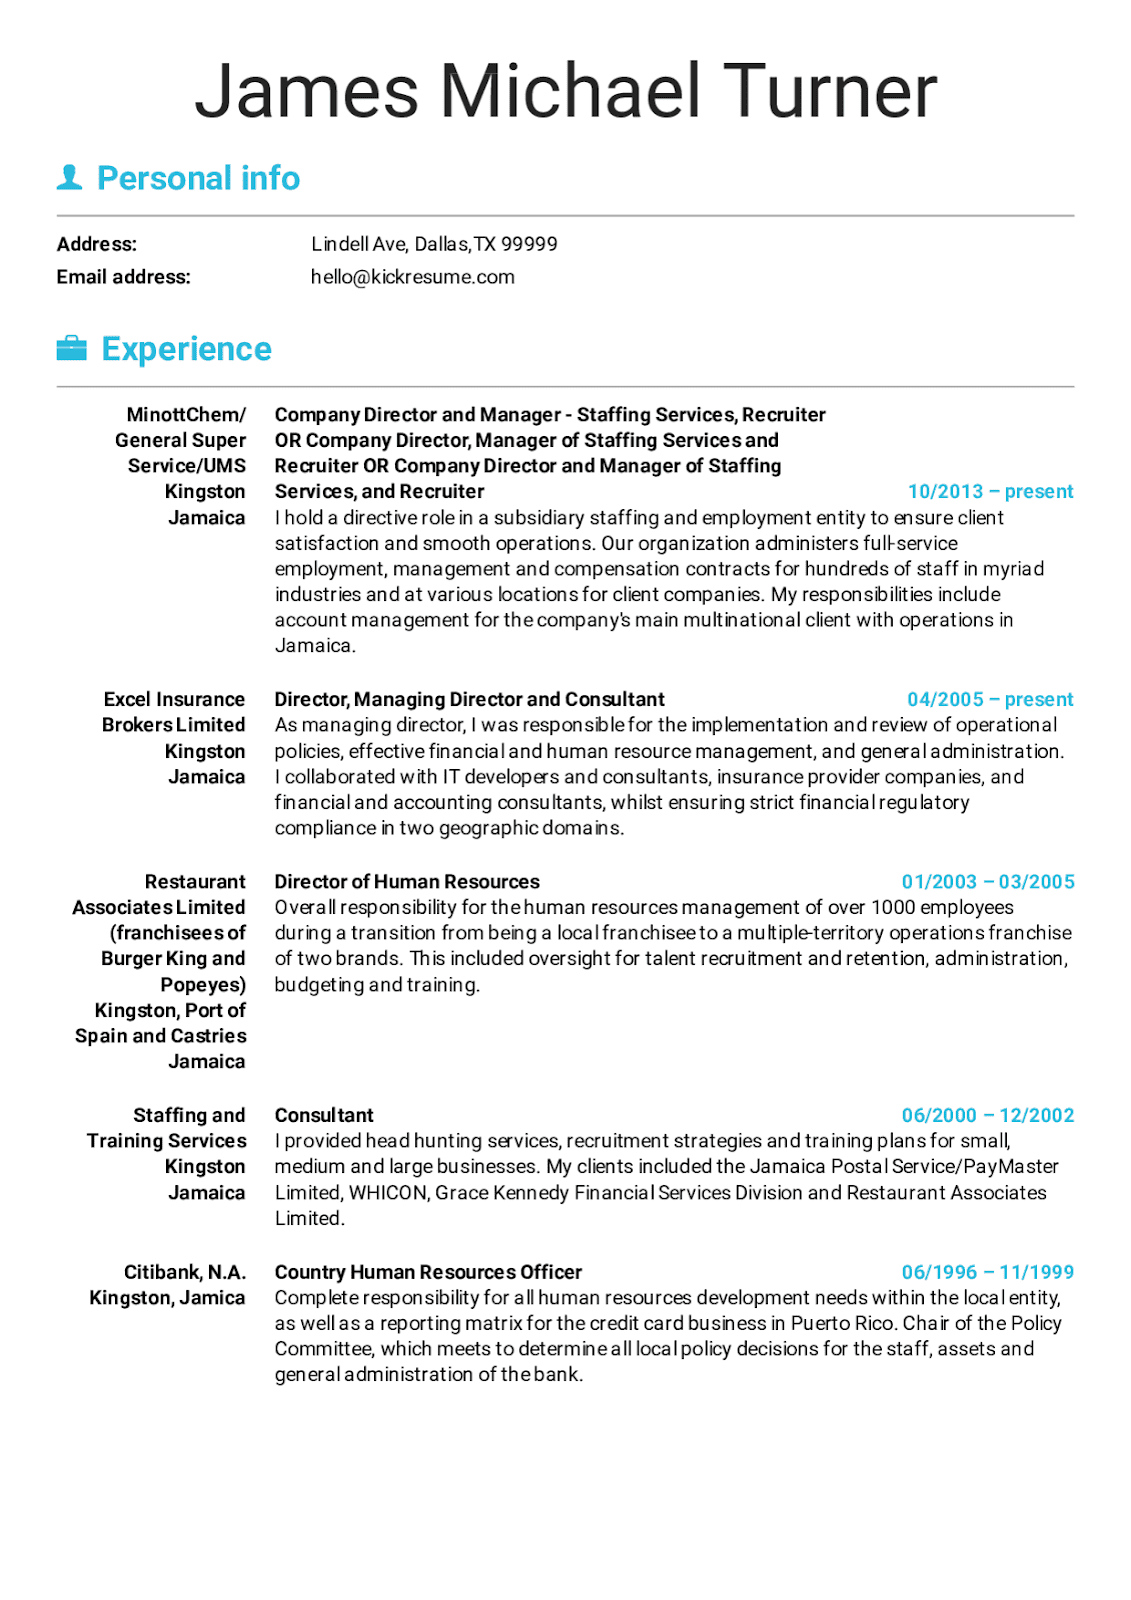 data analyst resume examples 2019 data analyst resume sample 2020 data analyst resume sample data analyst resume summary examples data analyst intern resume sample data analyst resume samples data analyst resume objective examples junior data analyst resume examples